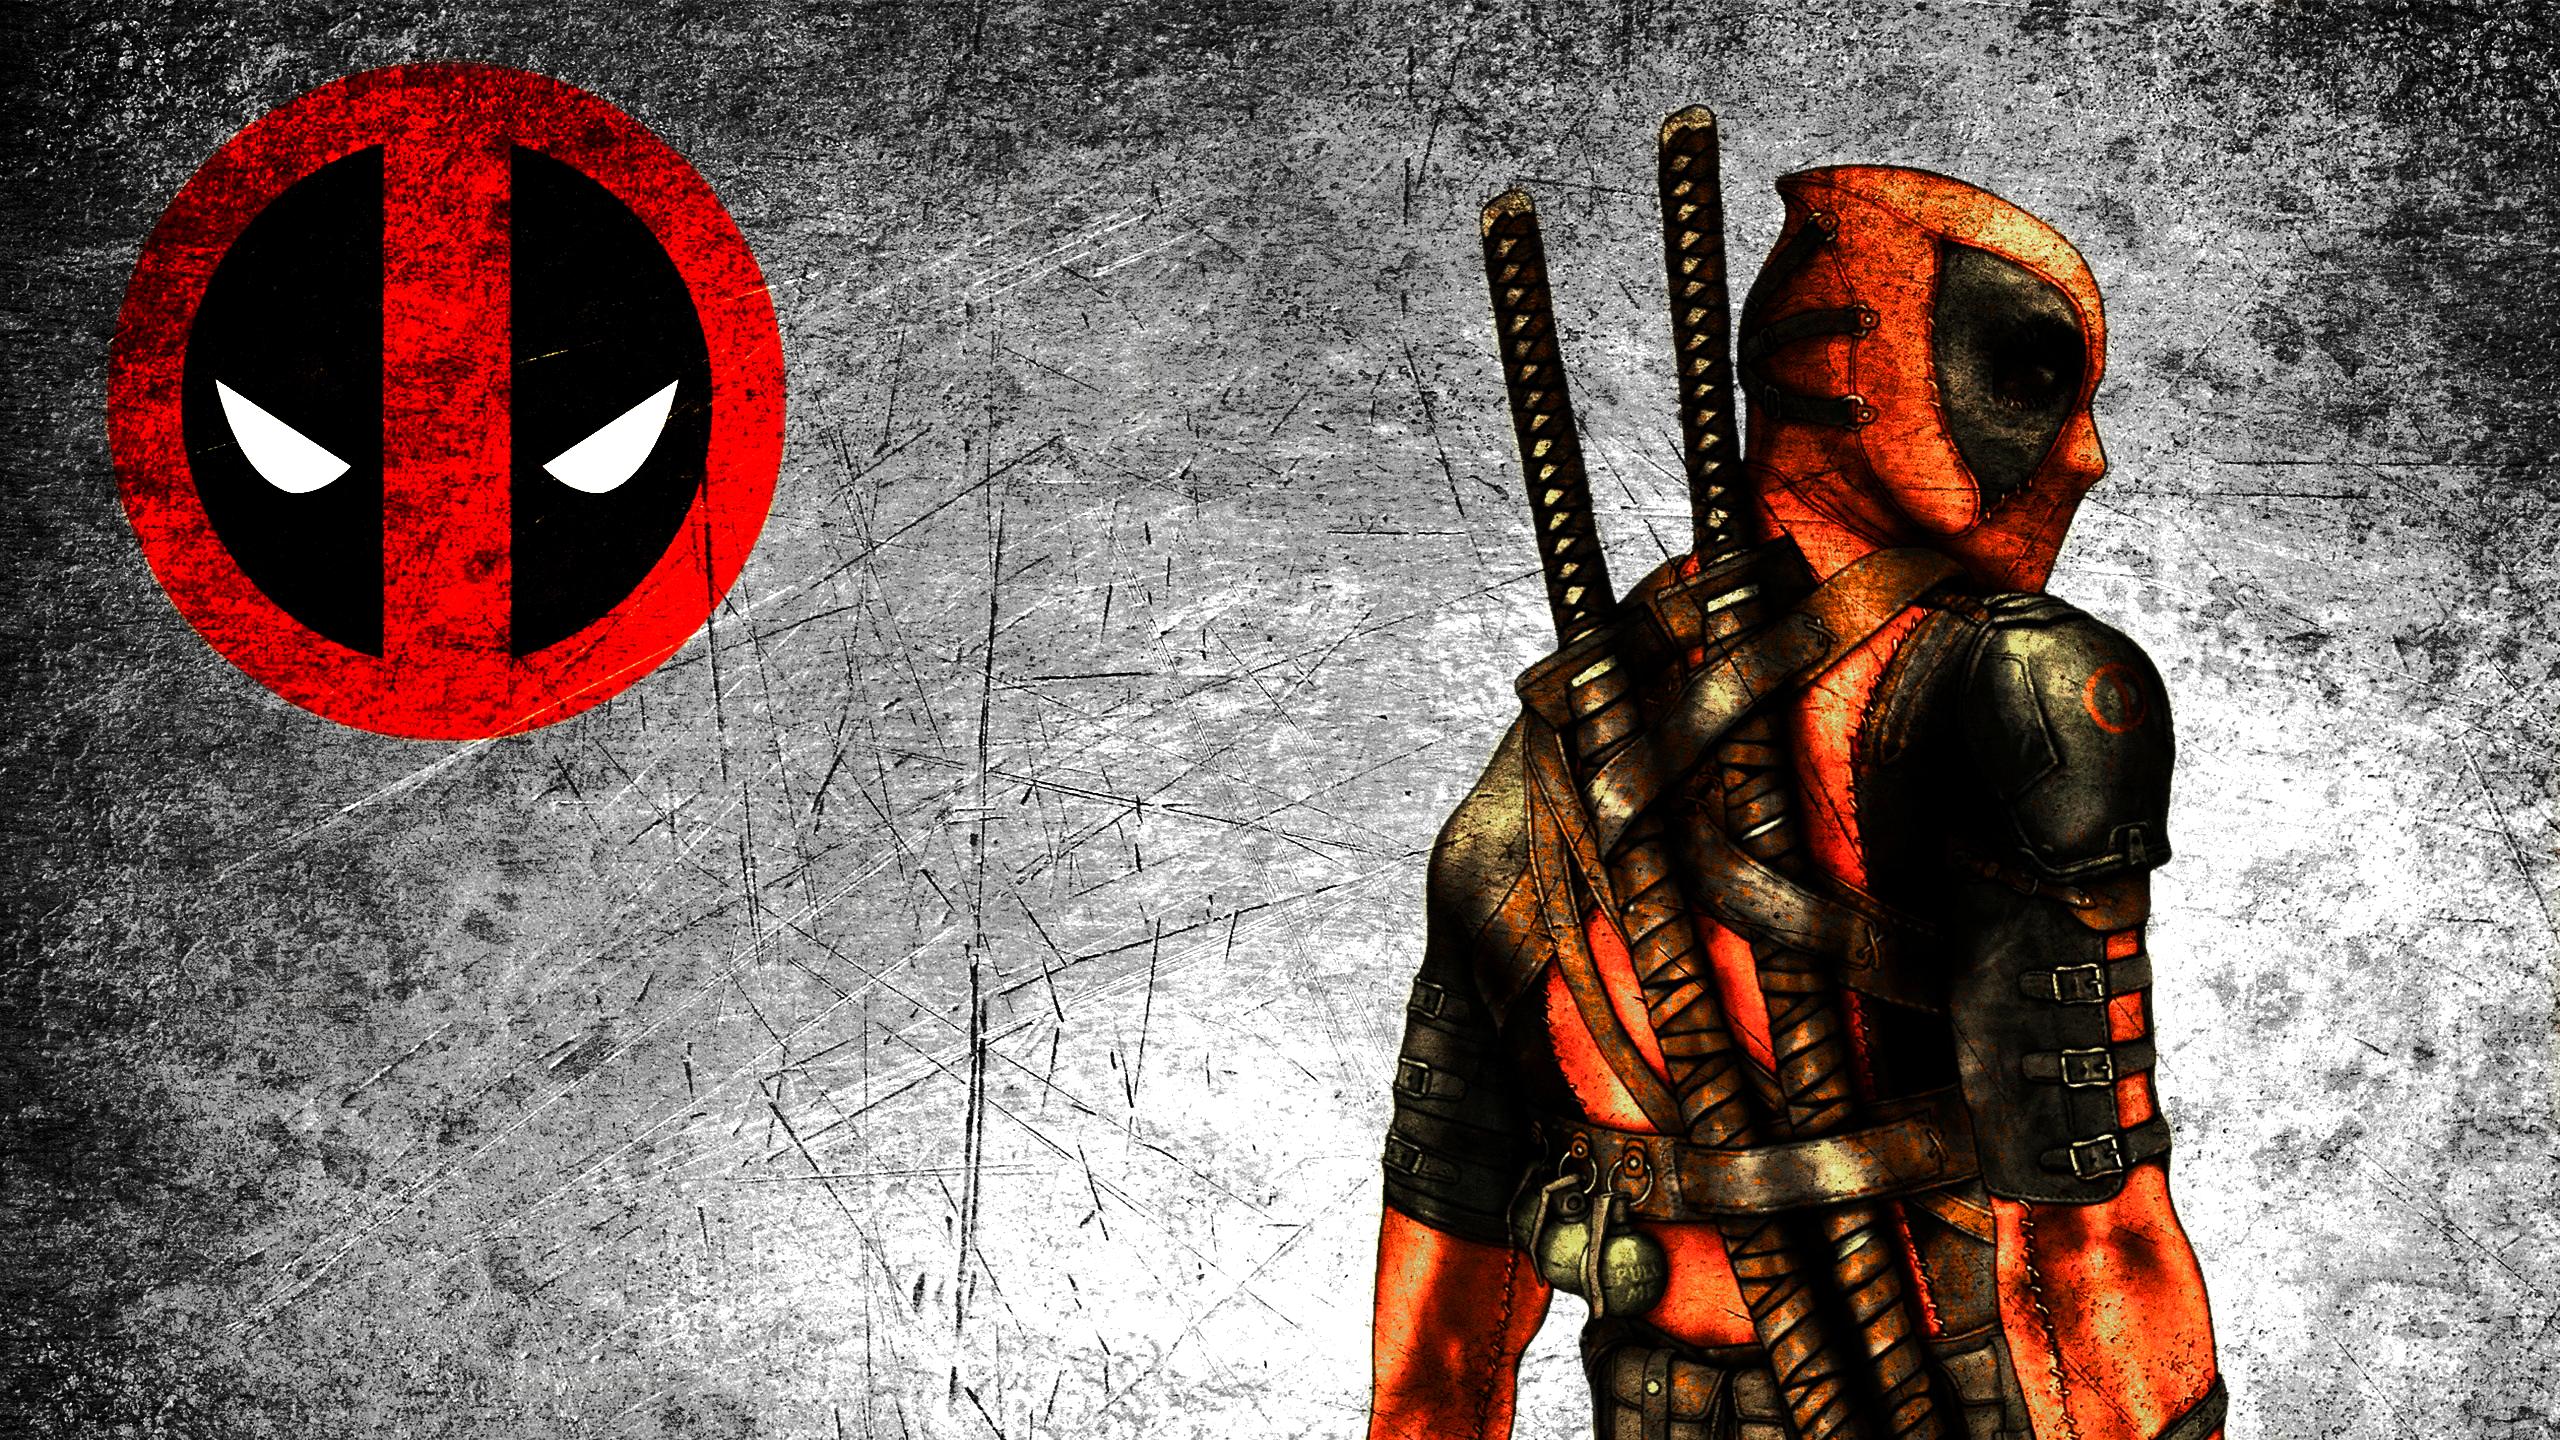 Deadpool-HD-Backgrounds-wallpaper-wp3604678